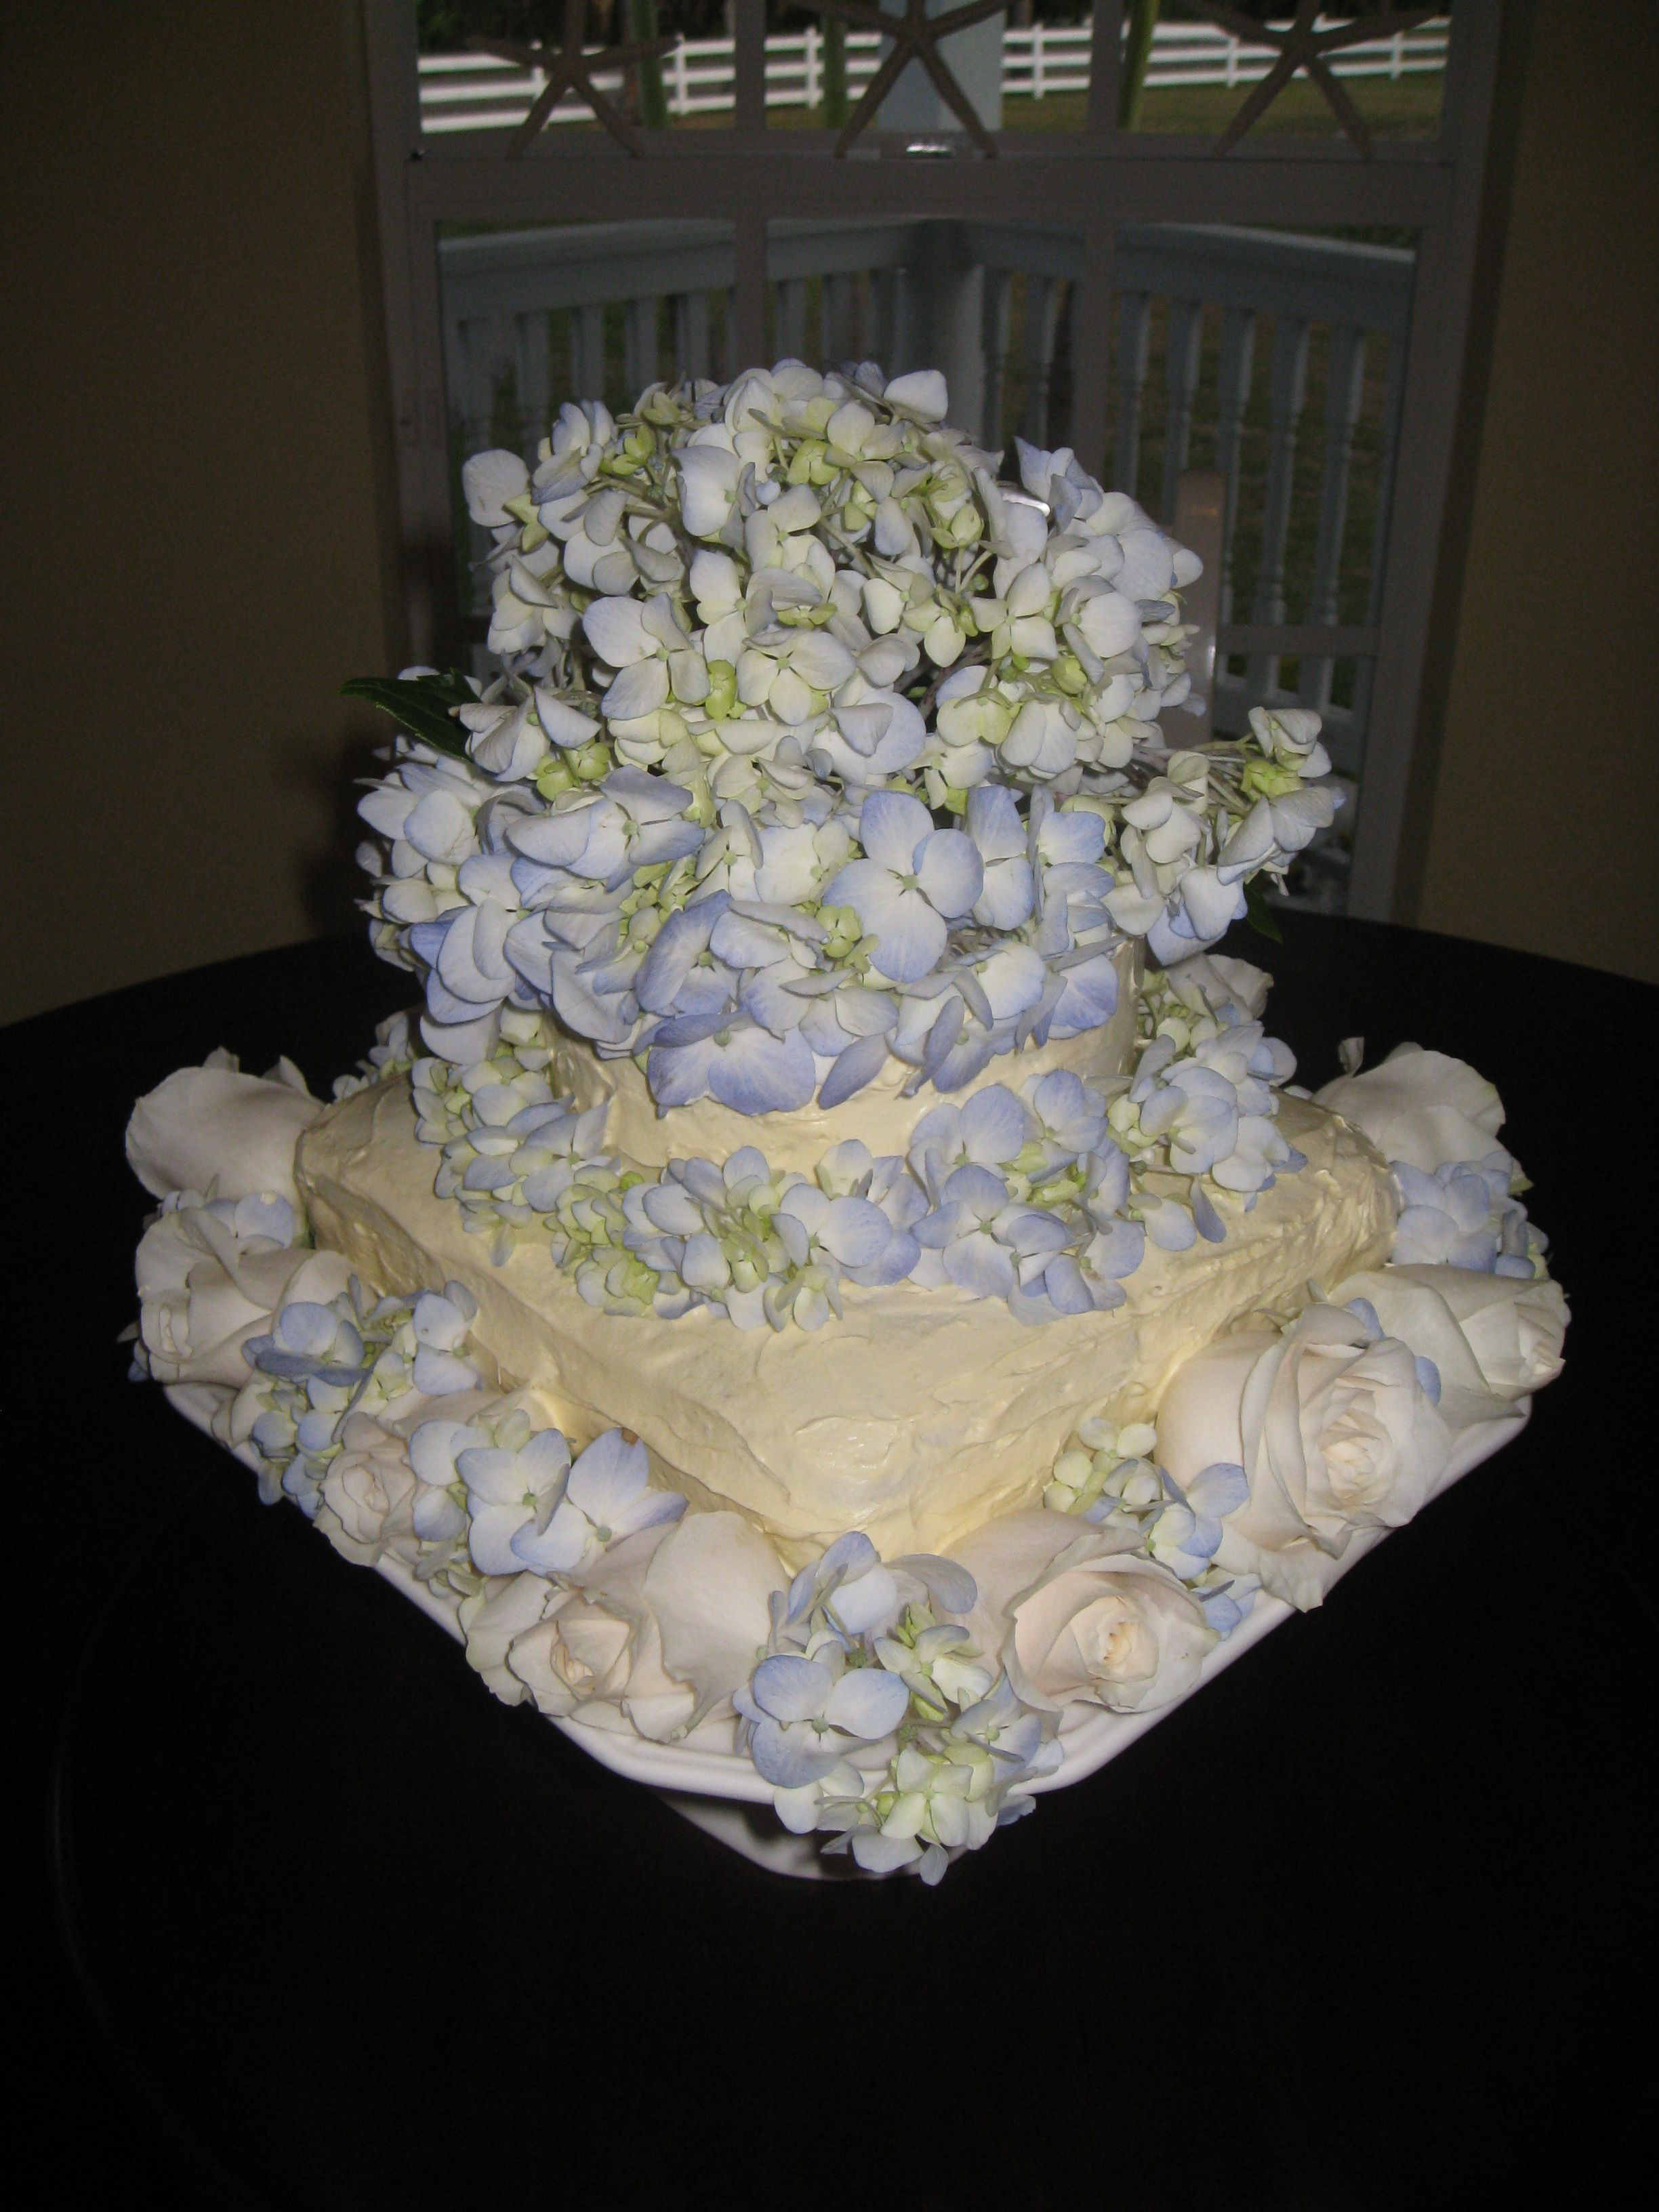 Bridal shower cake by Charlene Owens Shower cakes